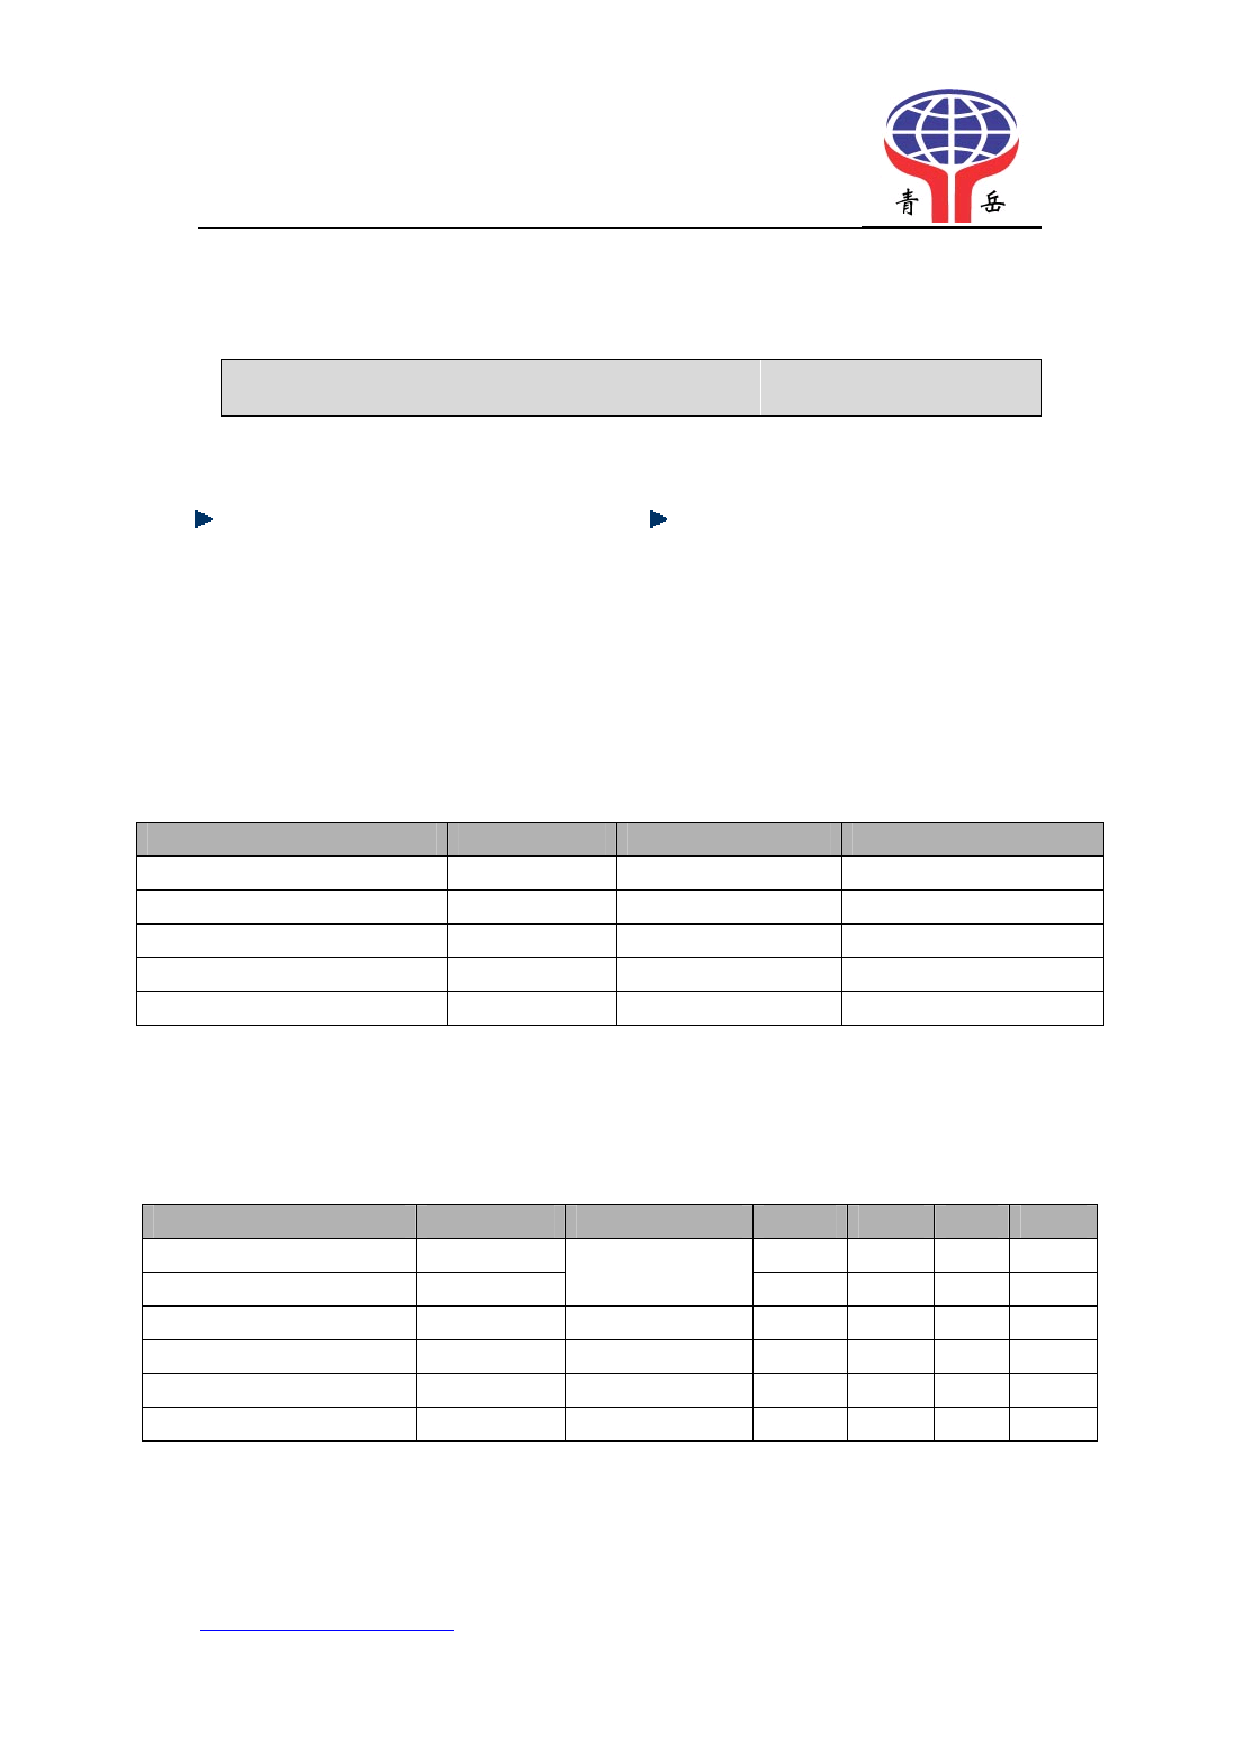 QY-S1010NP datasheet